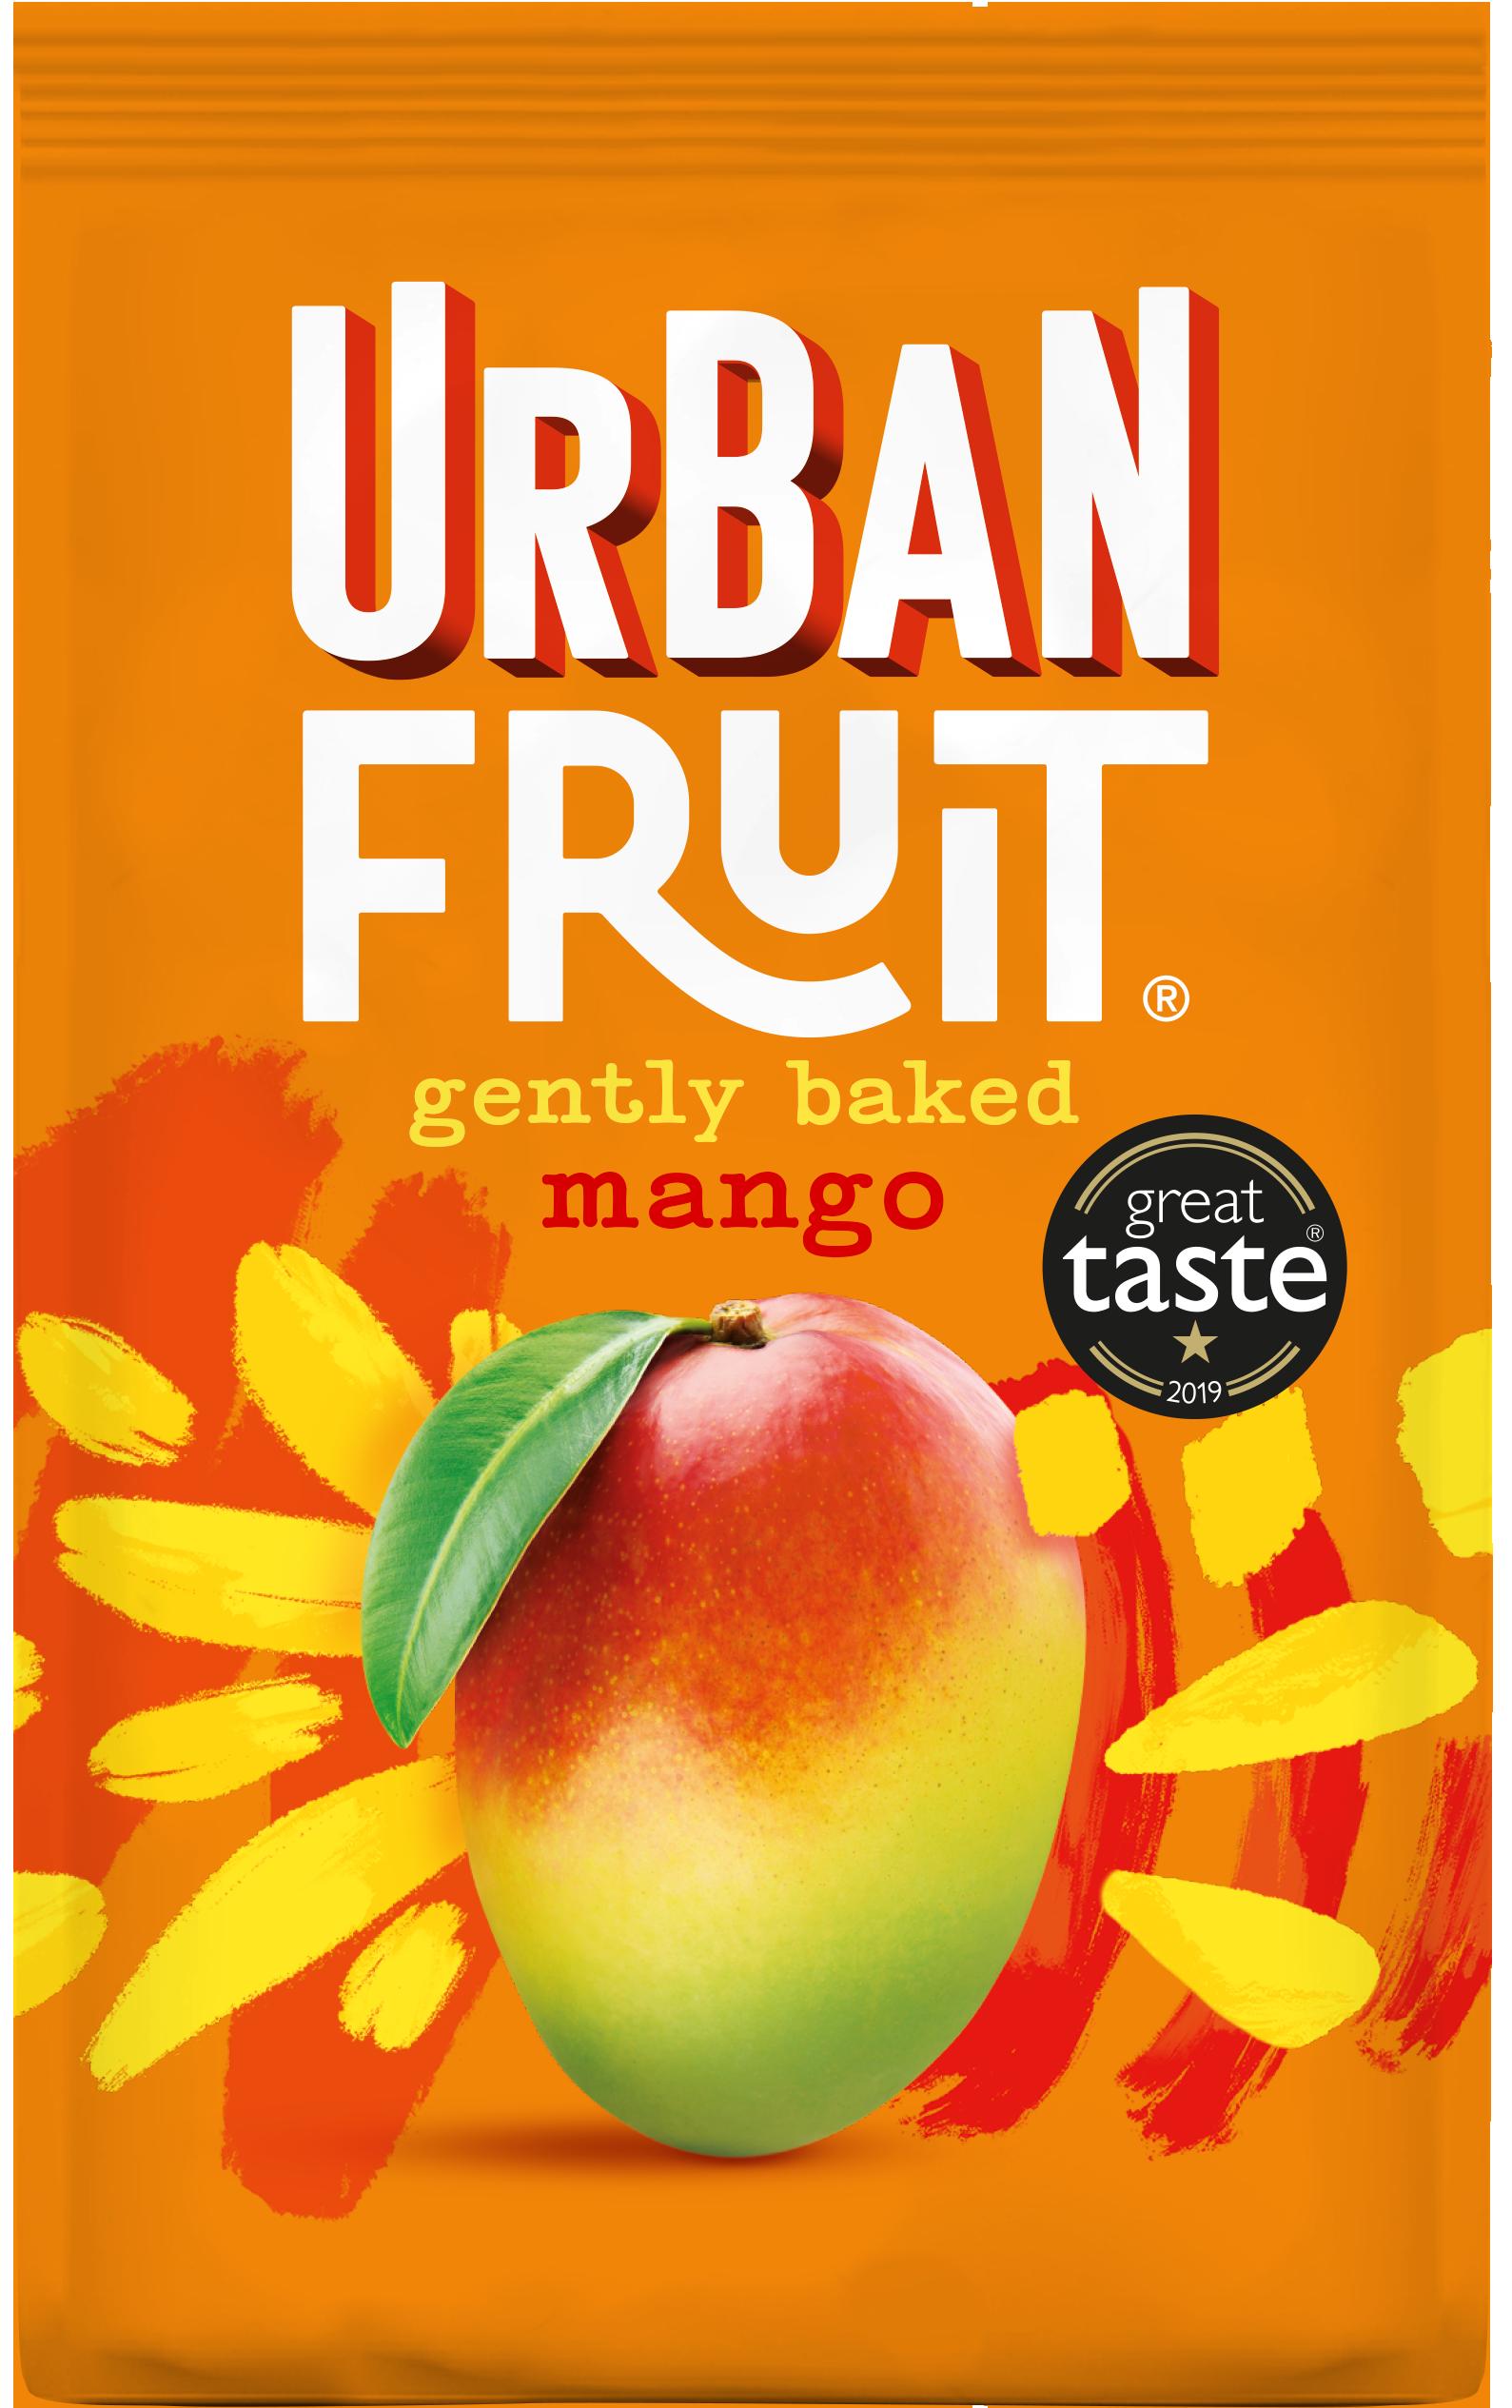 [Sharing] Mango